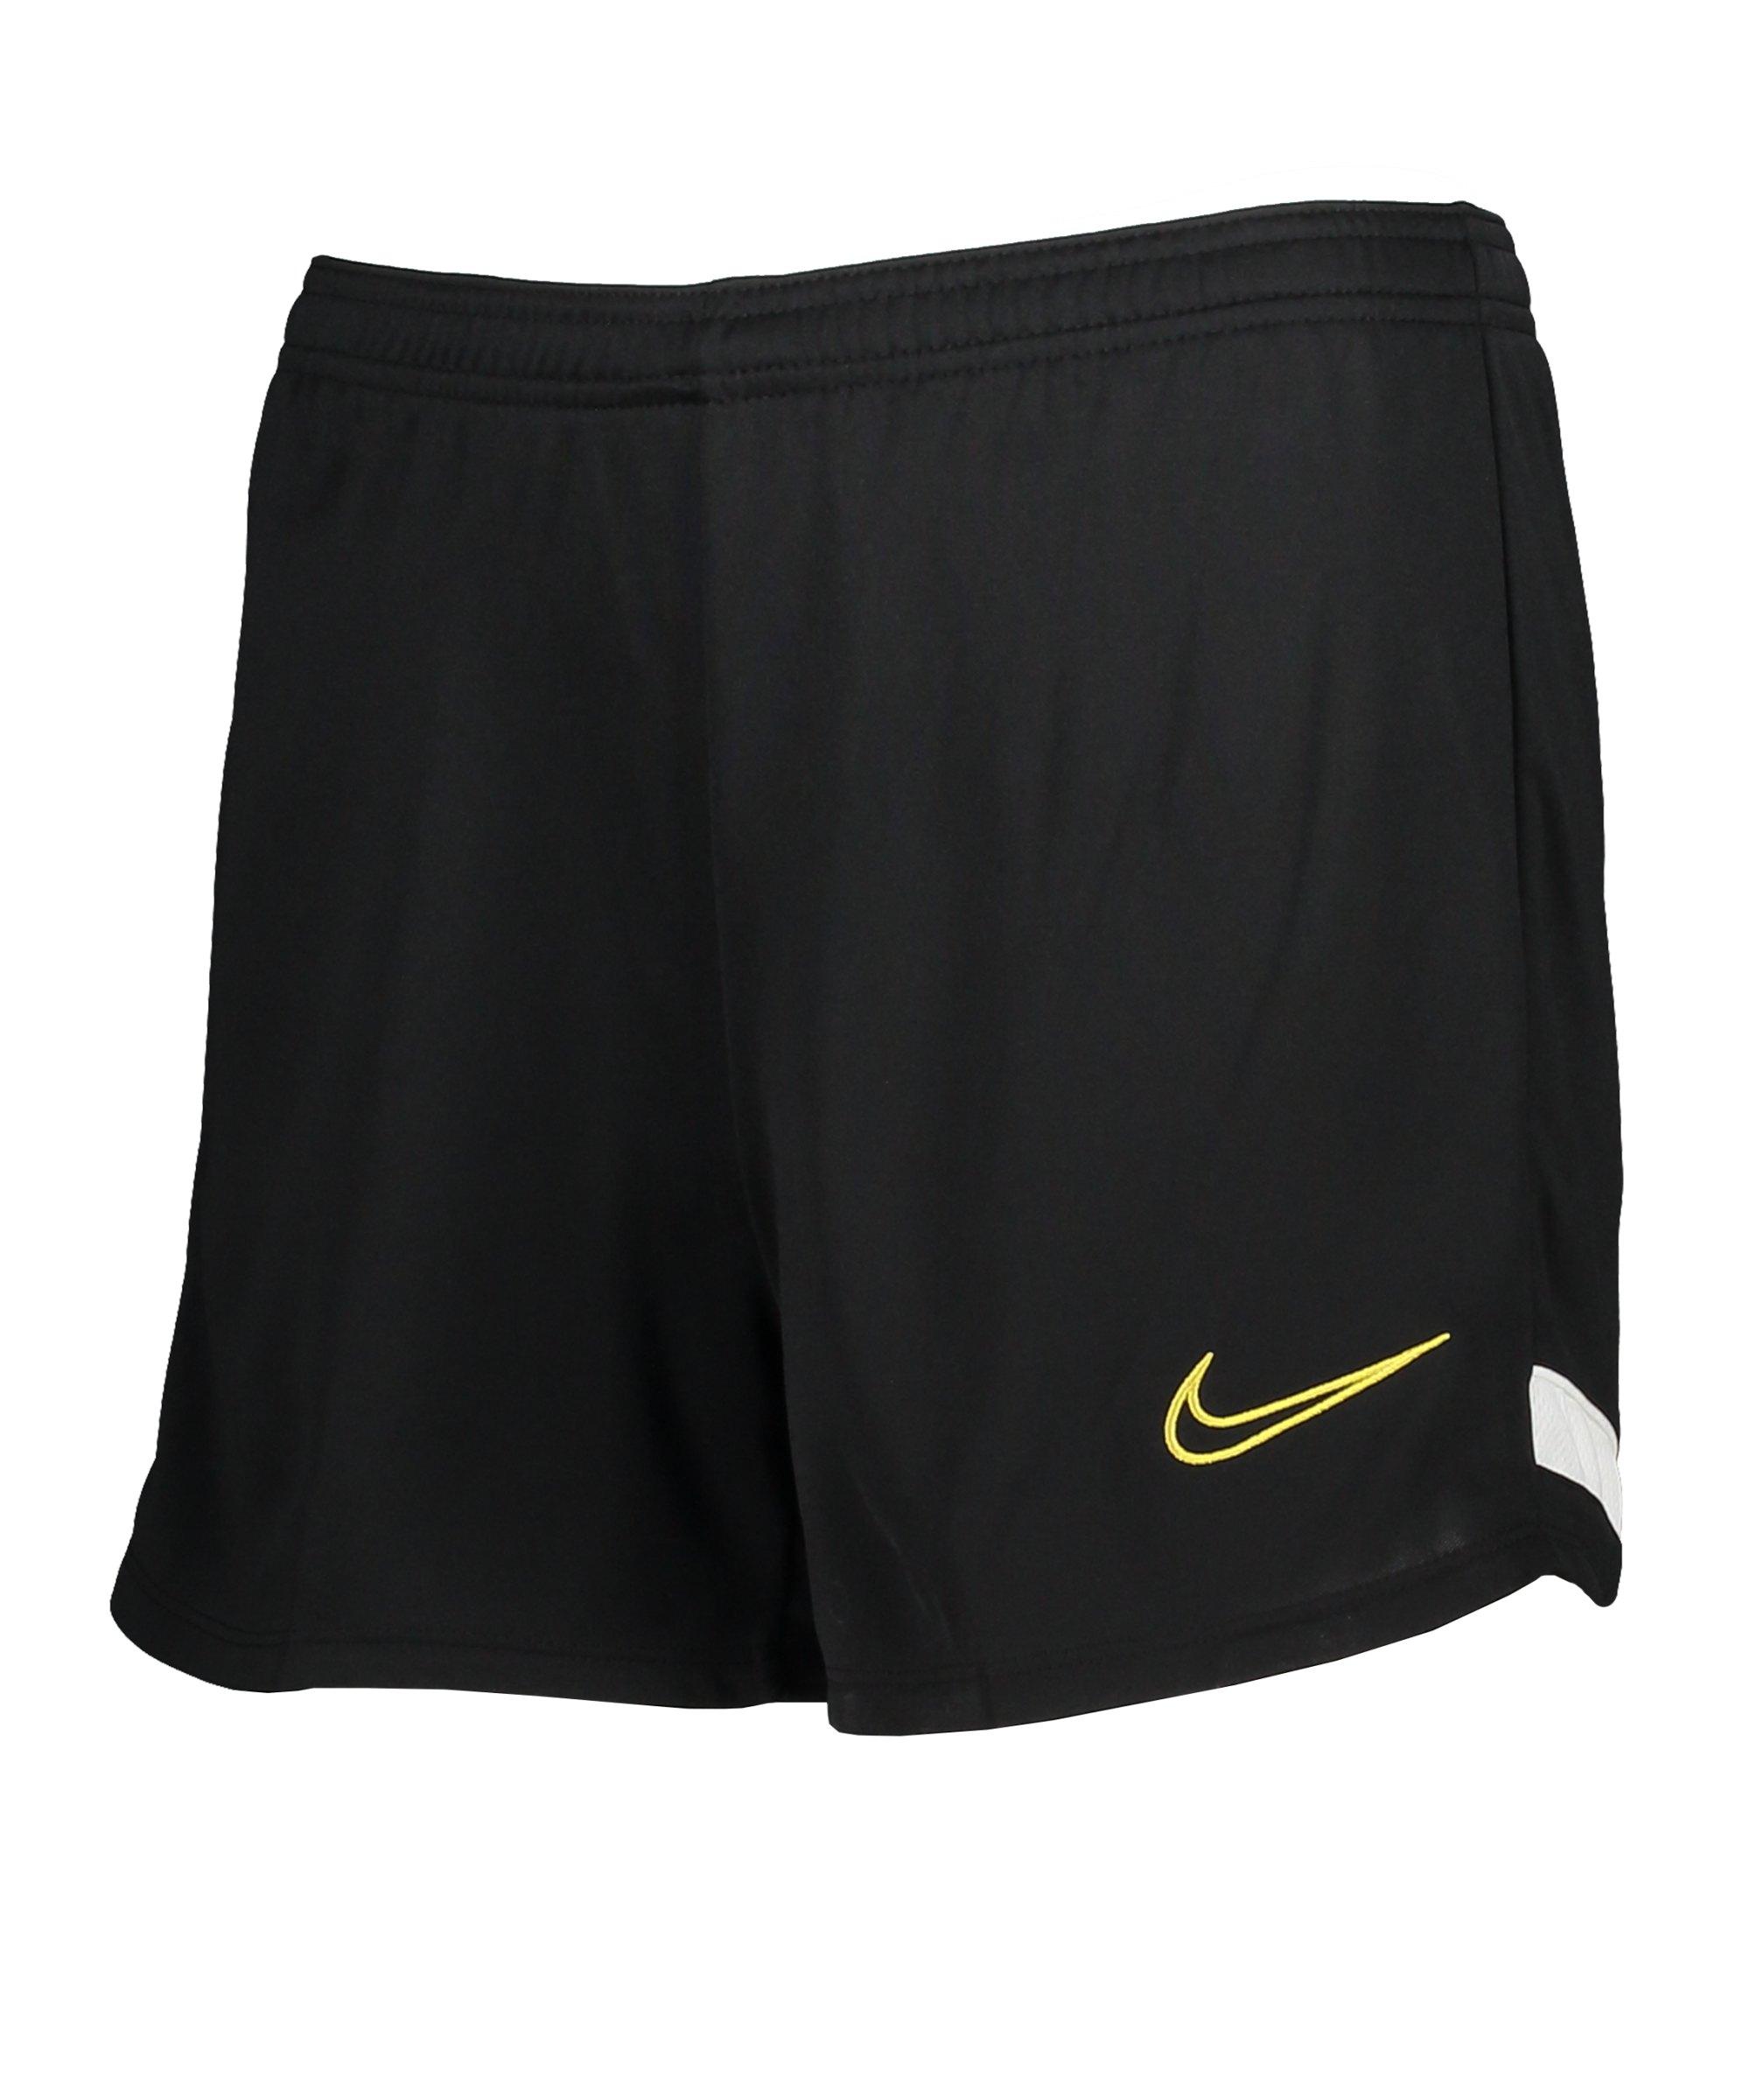 Nike Academy 21 Short Damen Schwarz Gold F013 - schwarz